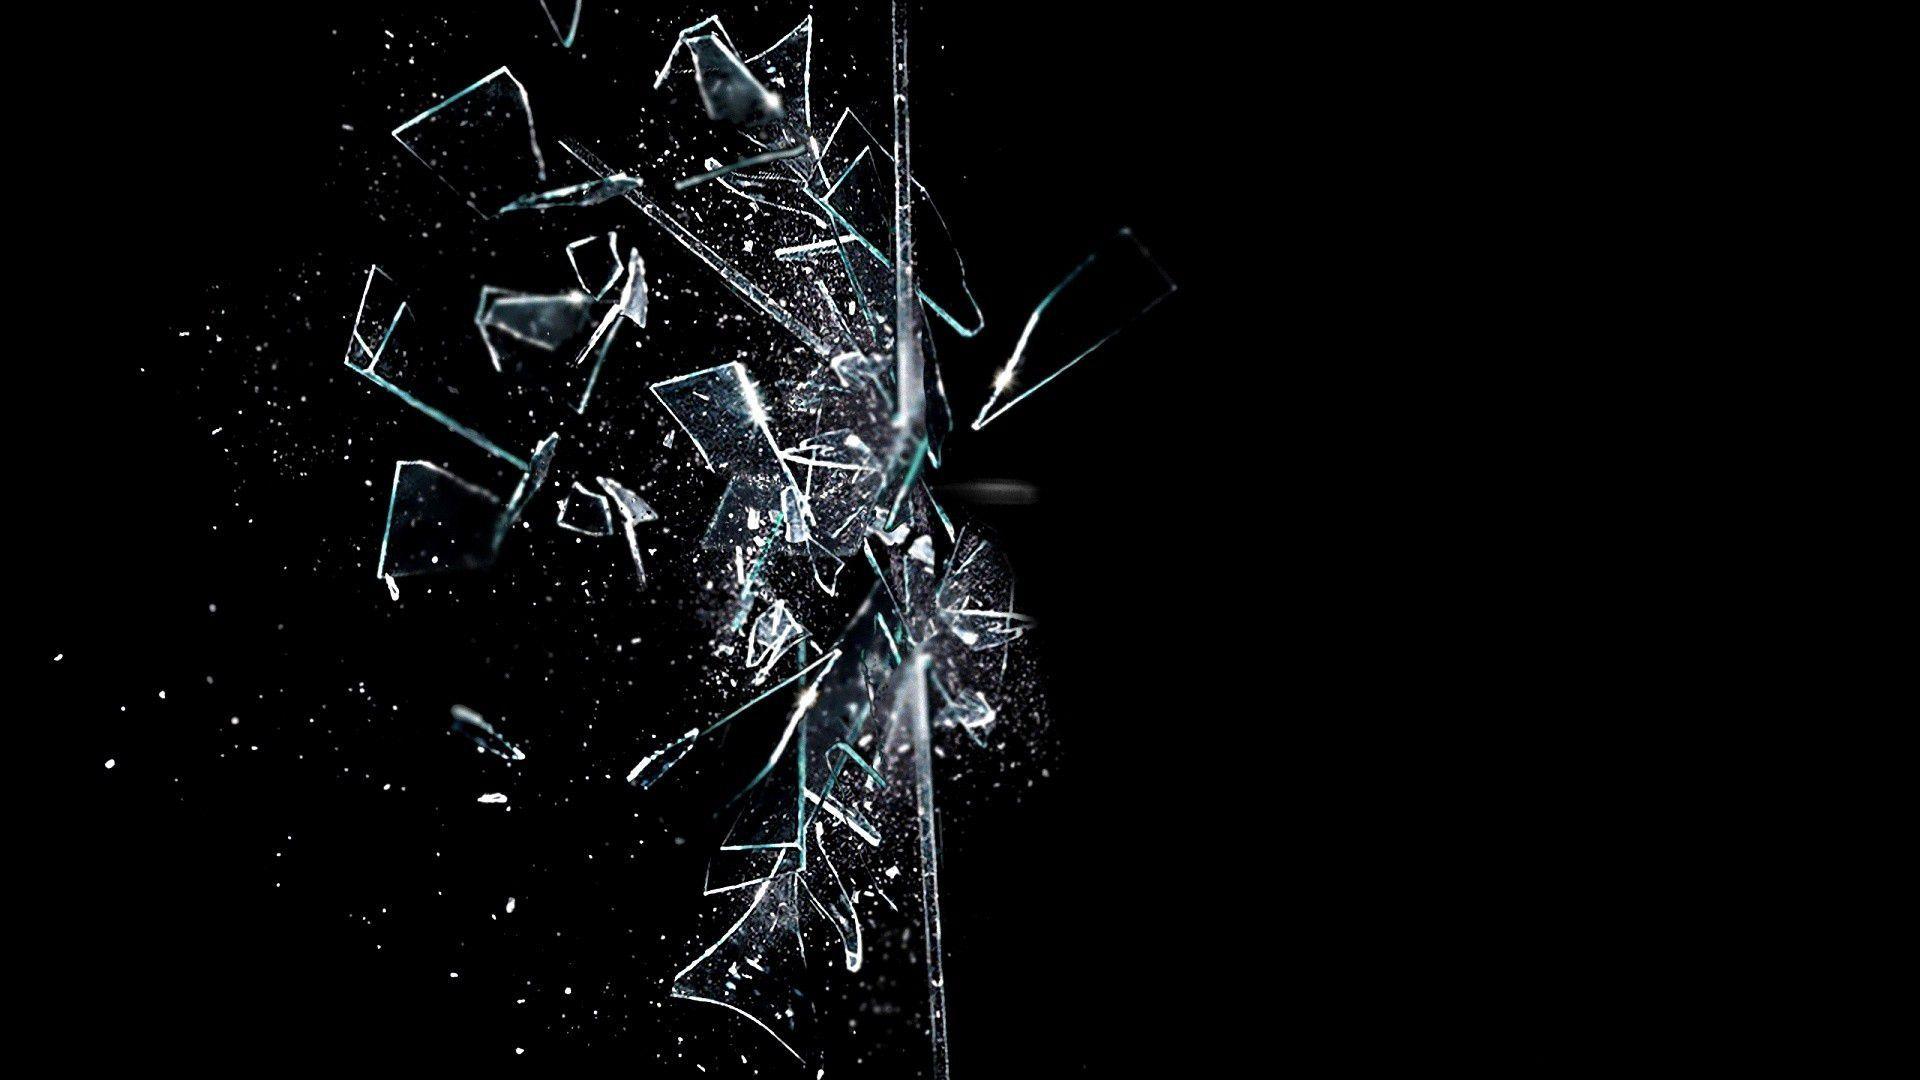 Cover Resources Broken Glass Wallpaper Broken Screen Wallpaper Shattered Glass